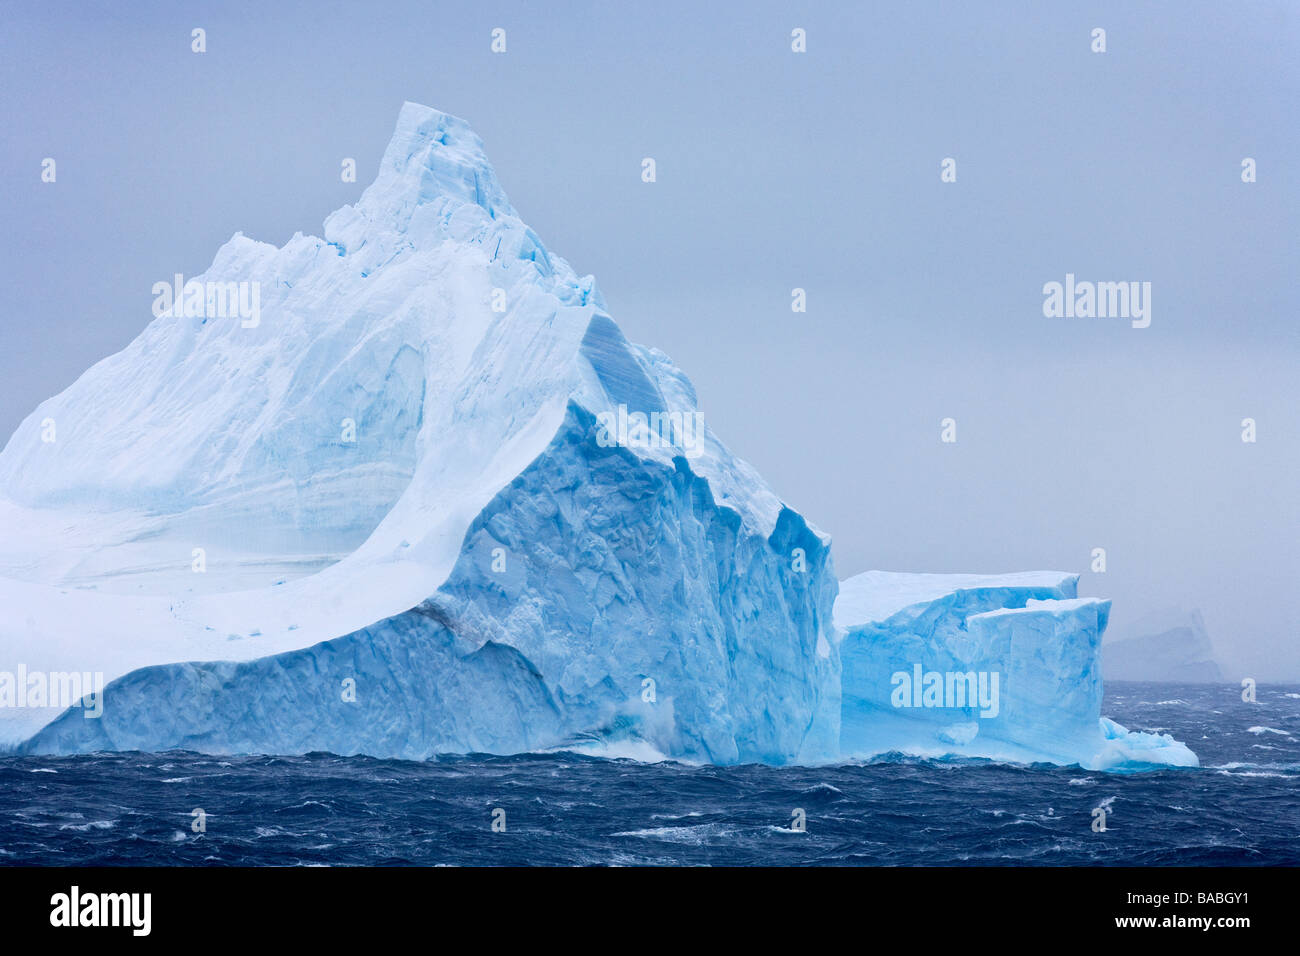 Blue iceberg in stormy seas Weddell Sea Antarctica - Stock Image